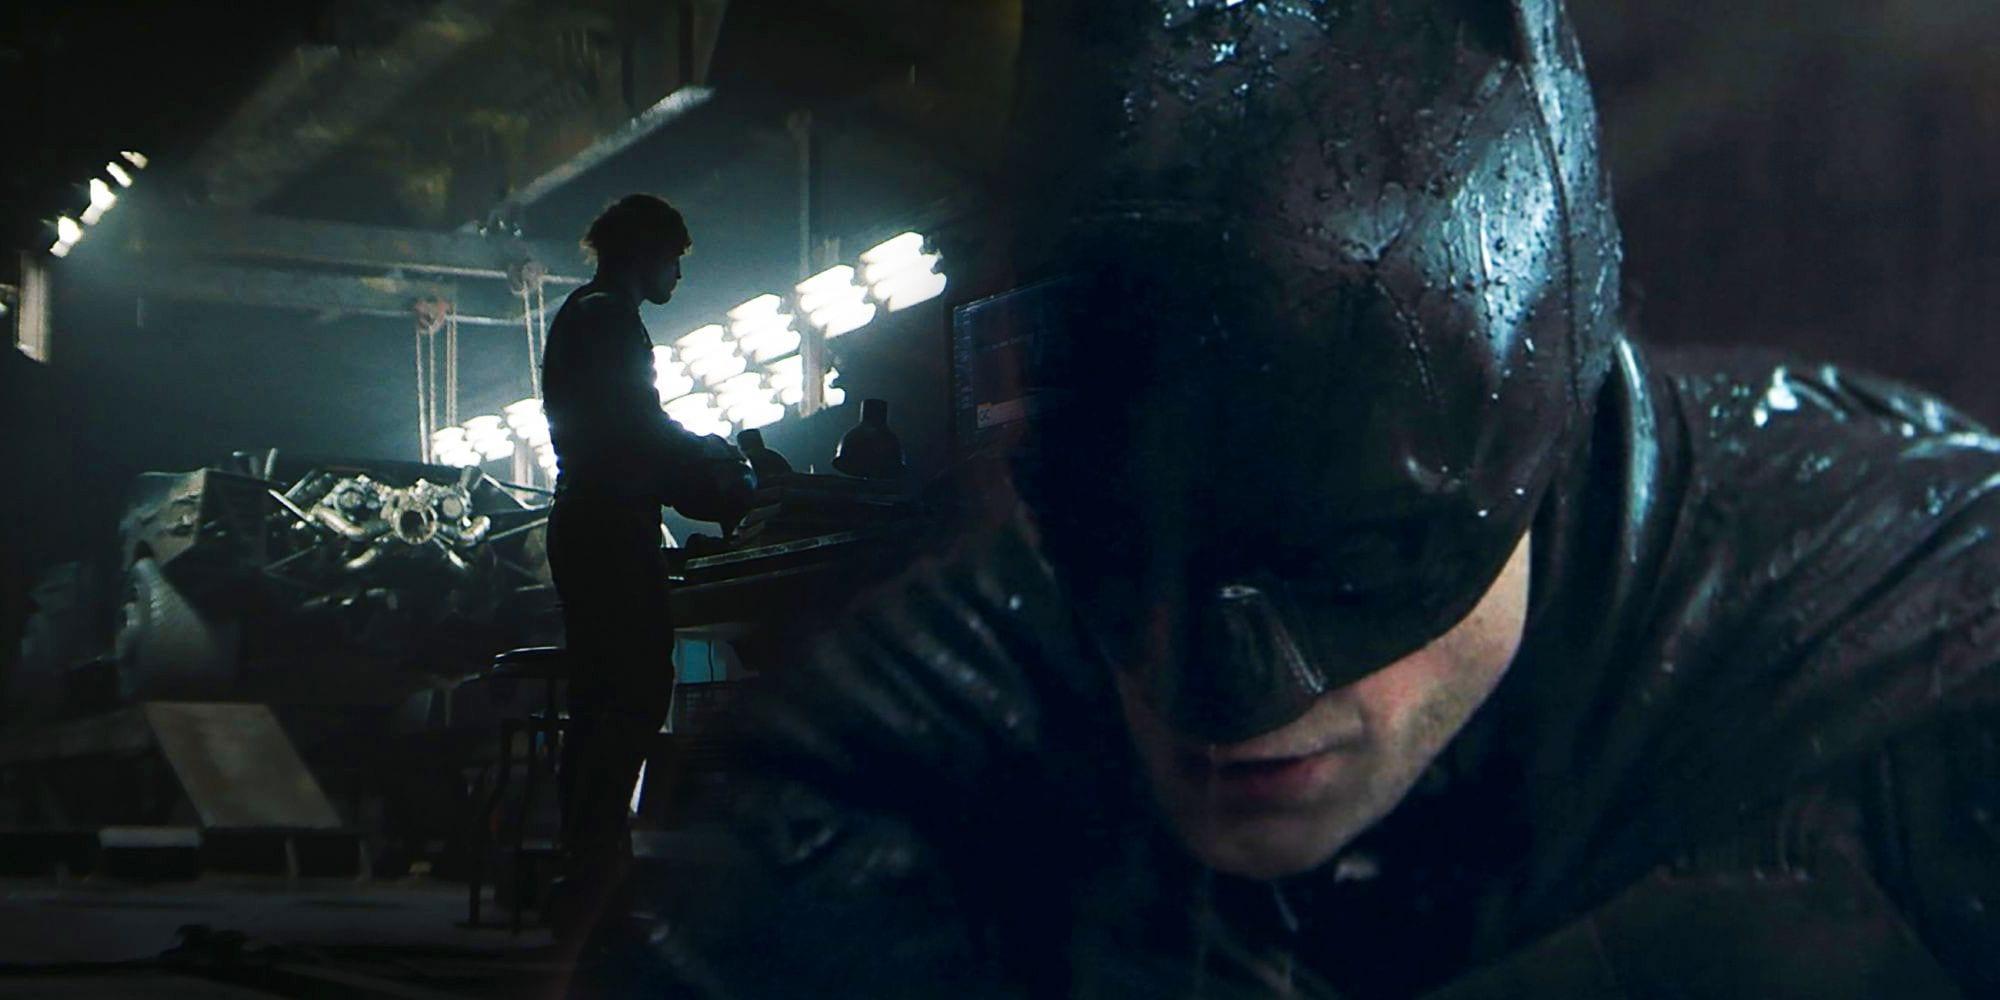 Robert-Pattinson-ibatcave-in-The-Batman